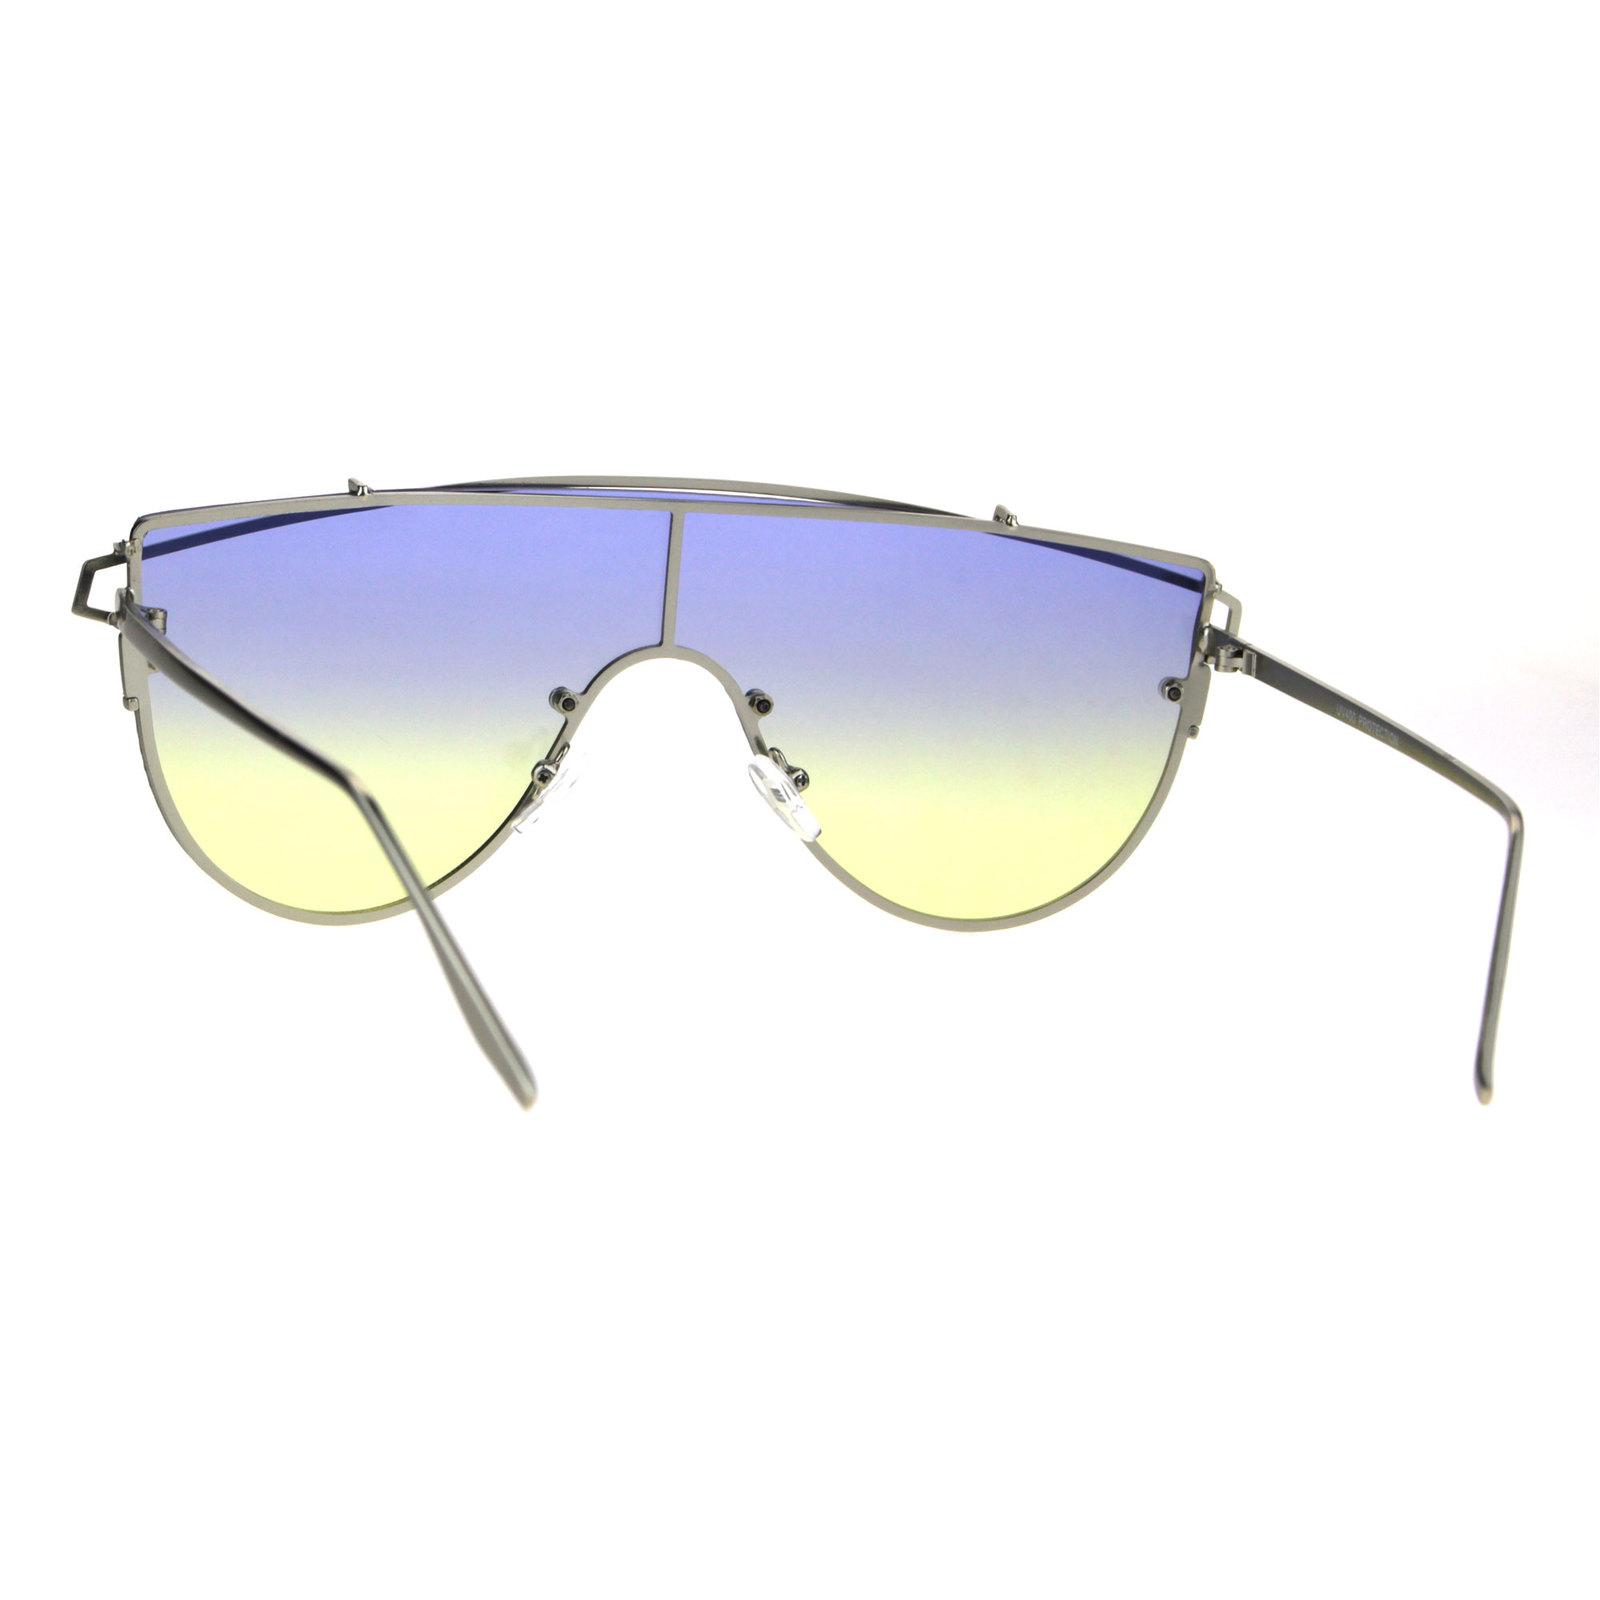 Oceanic Tie Dye Gradient Shield Robotic Futurism Sunglasses